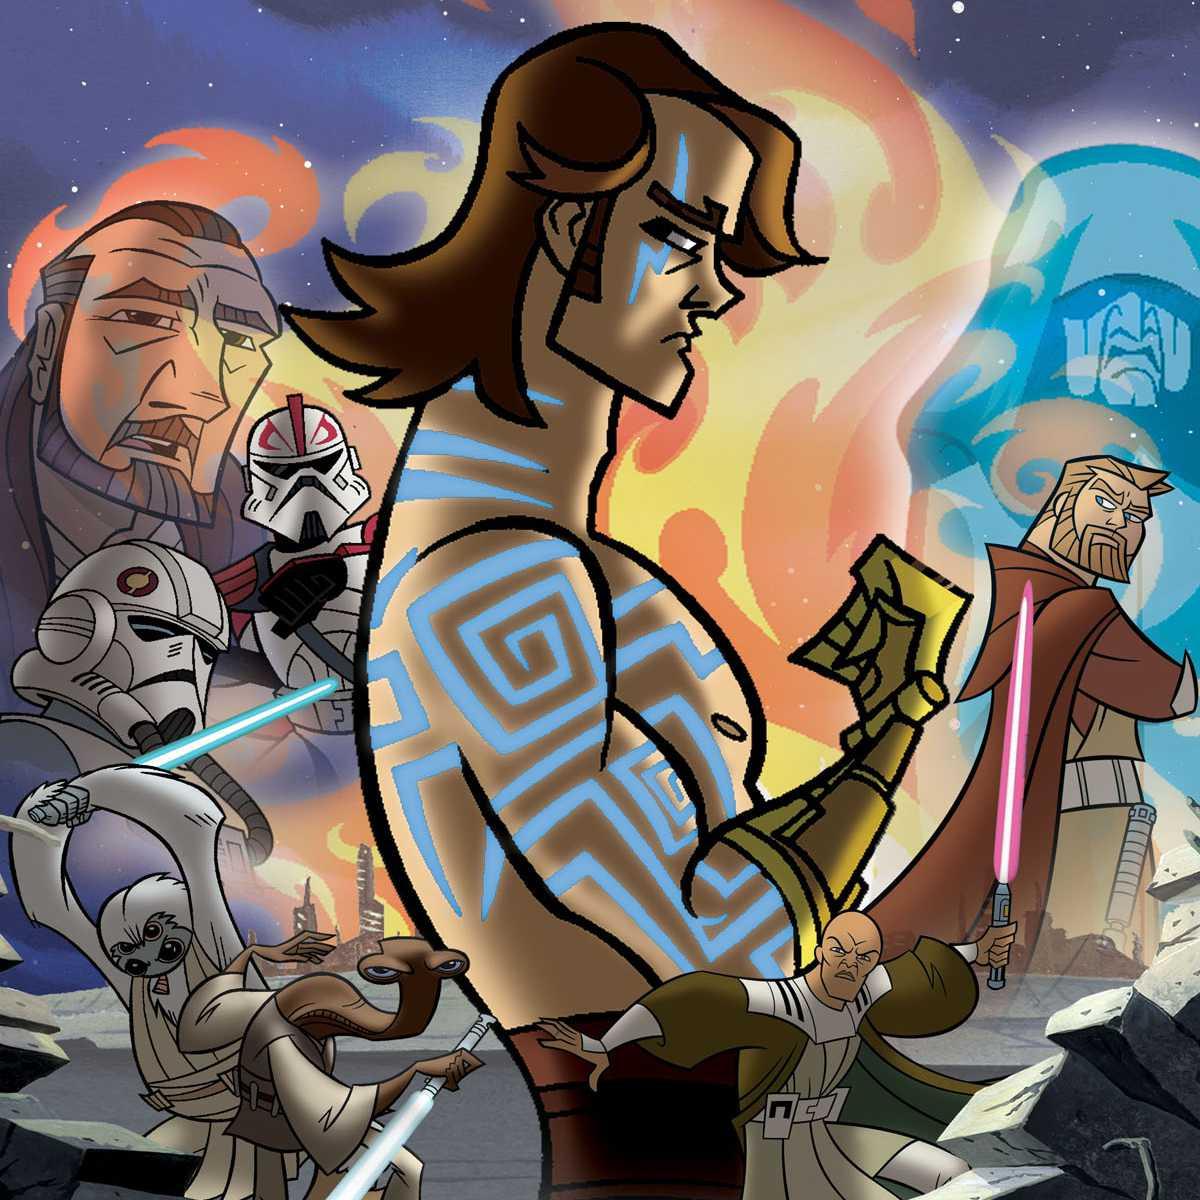 Anakin Skywalker and 'Clone Wars'